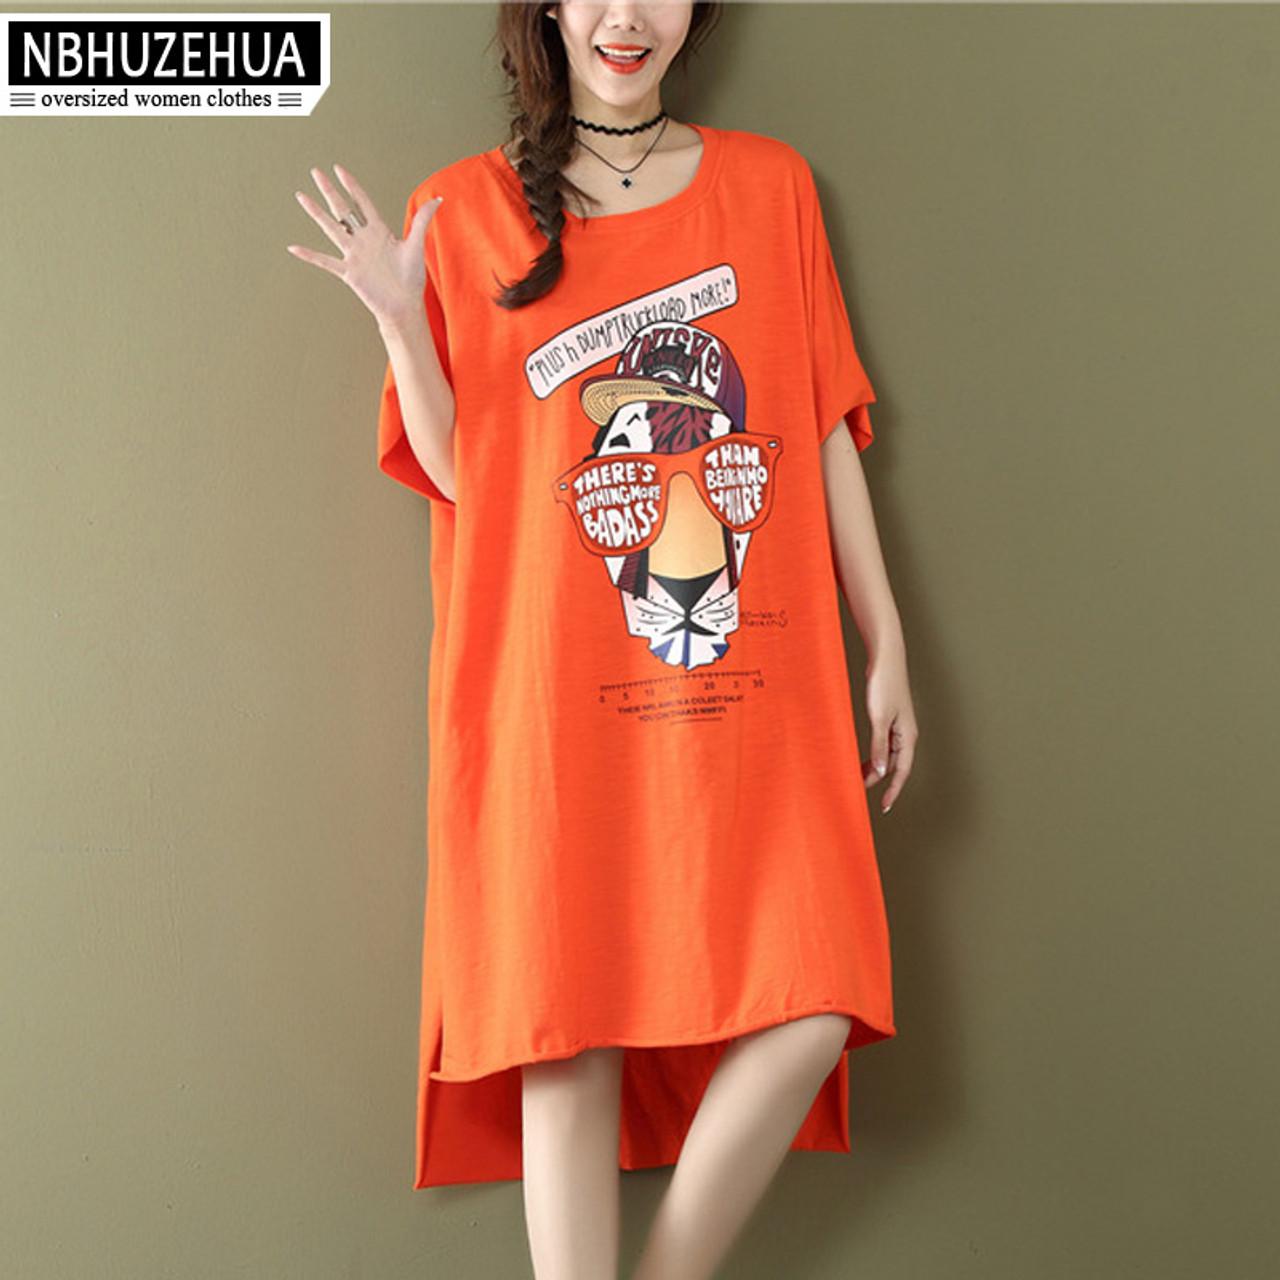 5d08b5042d NBHUZEHUA 7G689 Summer Long Women Tops Harajuku Kawaii Cartoon Printed  T-Shirt Big Size Loose ...